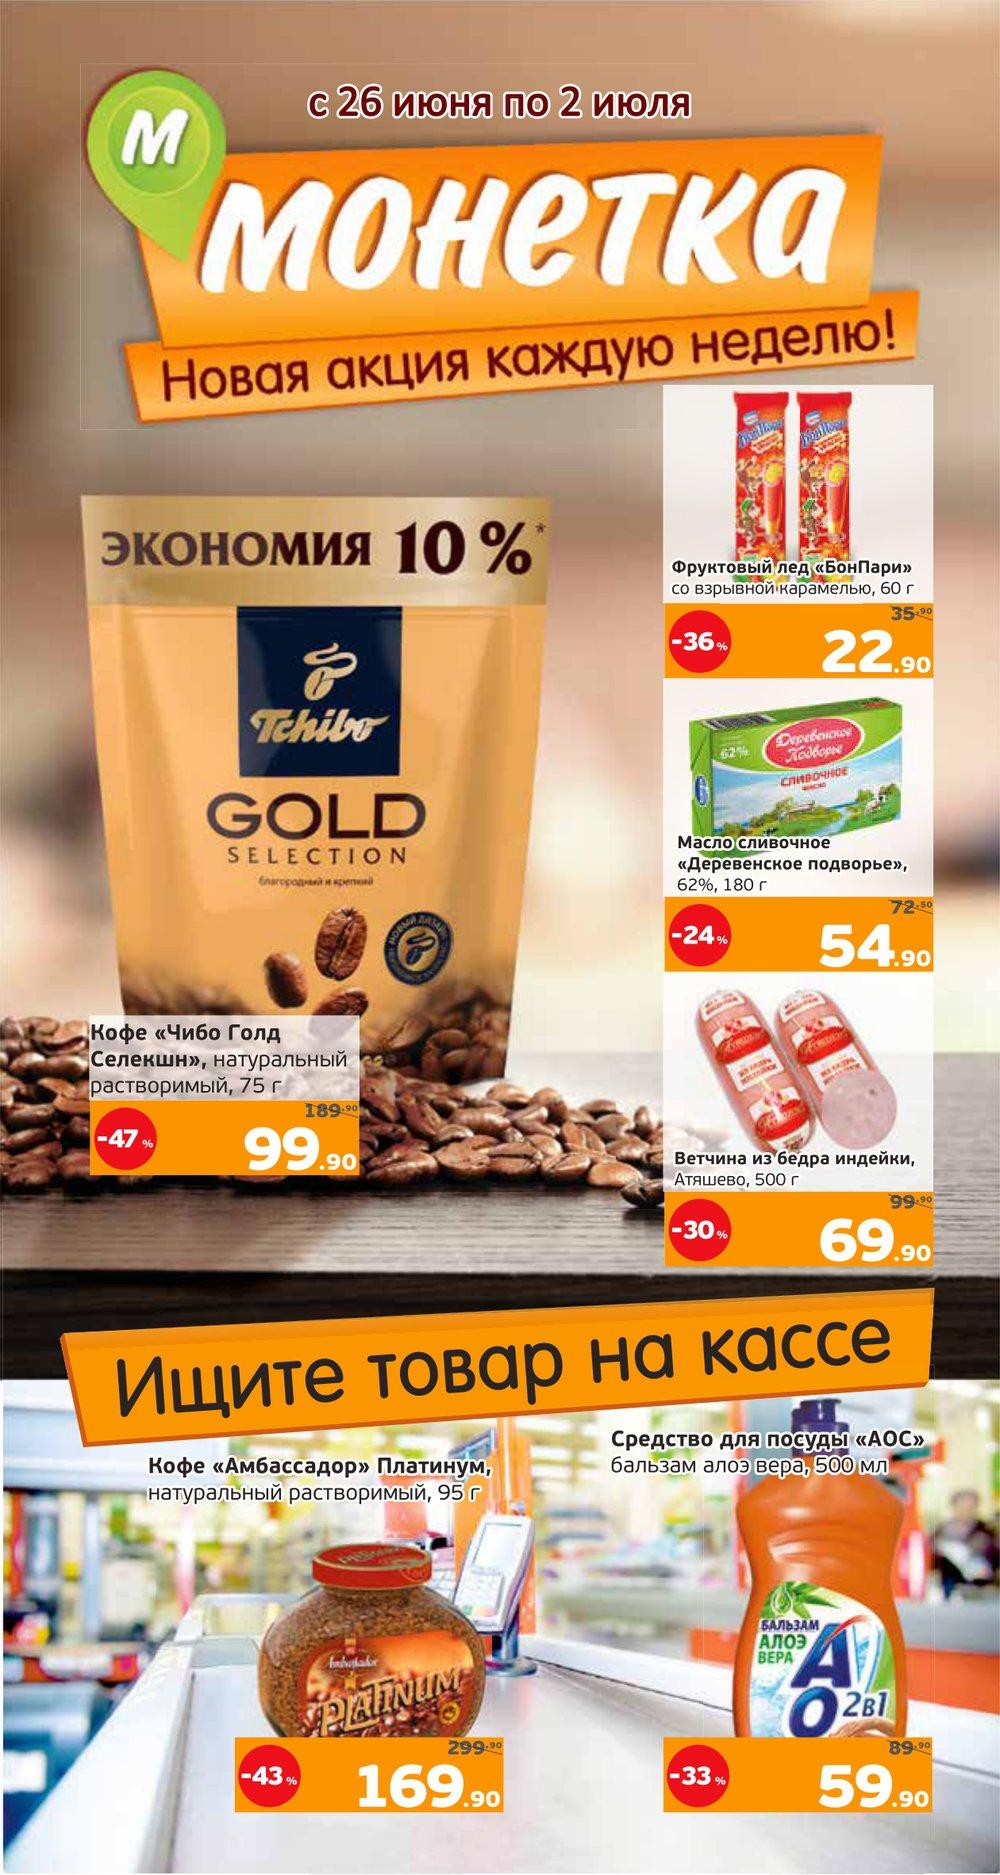 Каталог акций Монетка с 26 июня по 2 июля 2017 - стр. 2